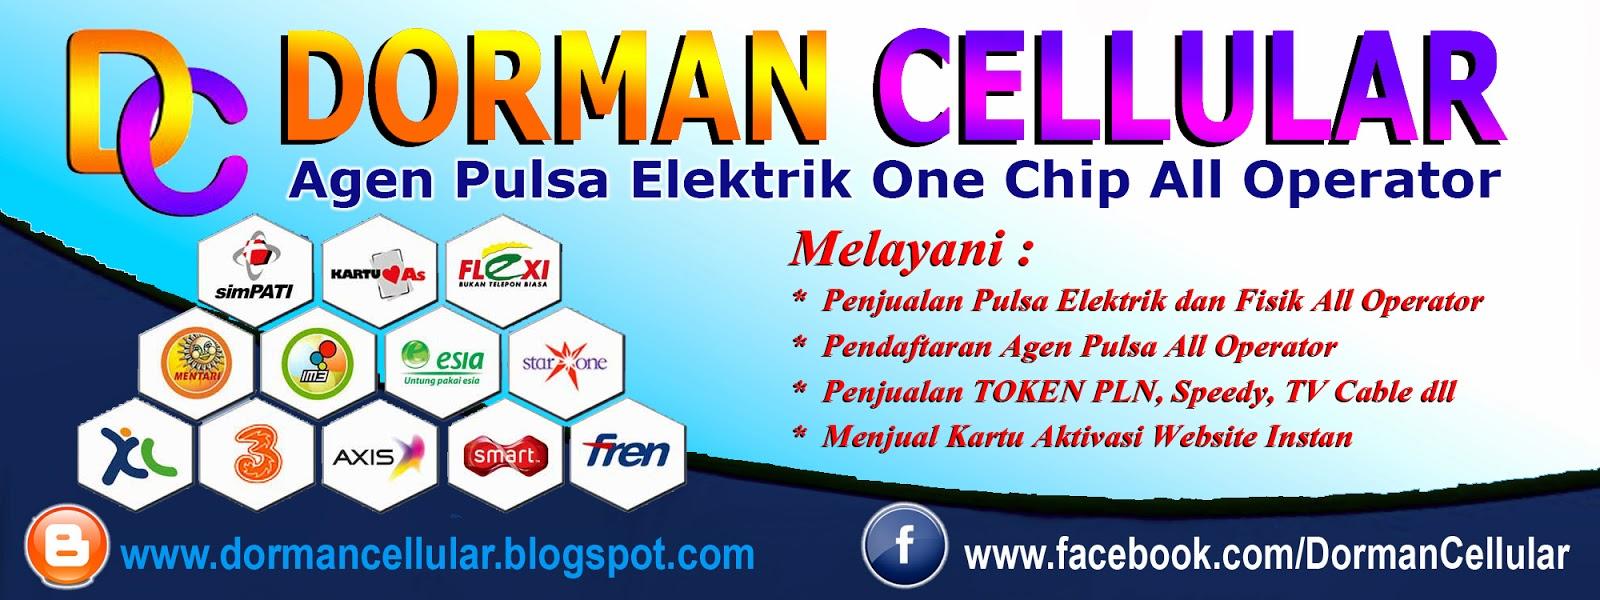 DORMAN CELLULAR: Contoh Banner Spanduk Pulsa